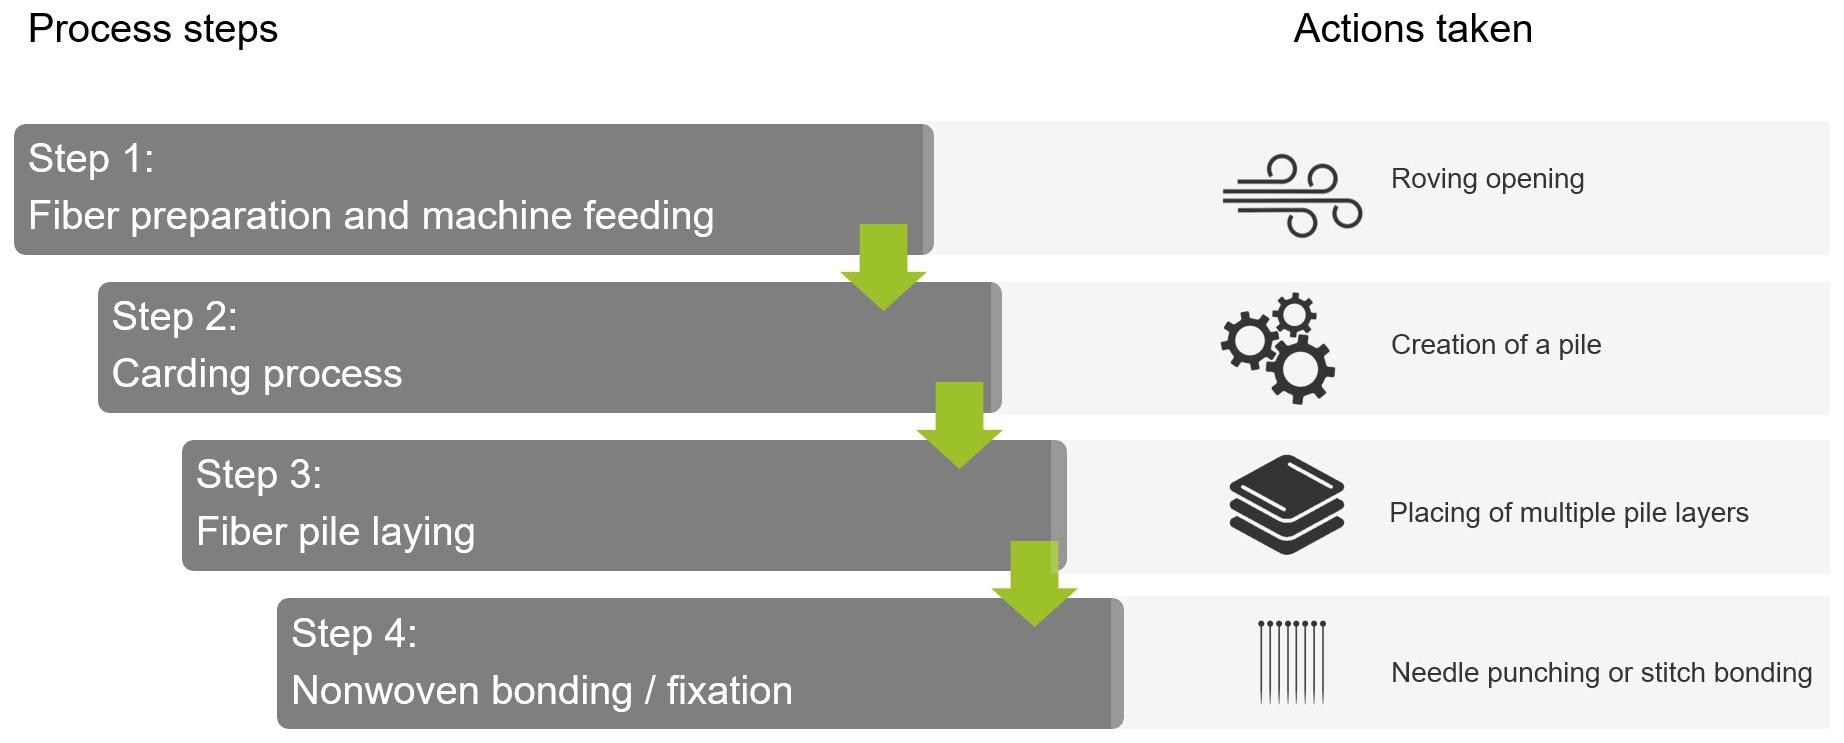 rCF-Vliesstoffe-Prozess-Fertigung-Vliesstoffe__verkleinert